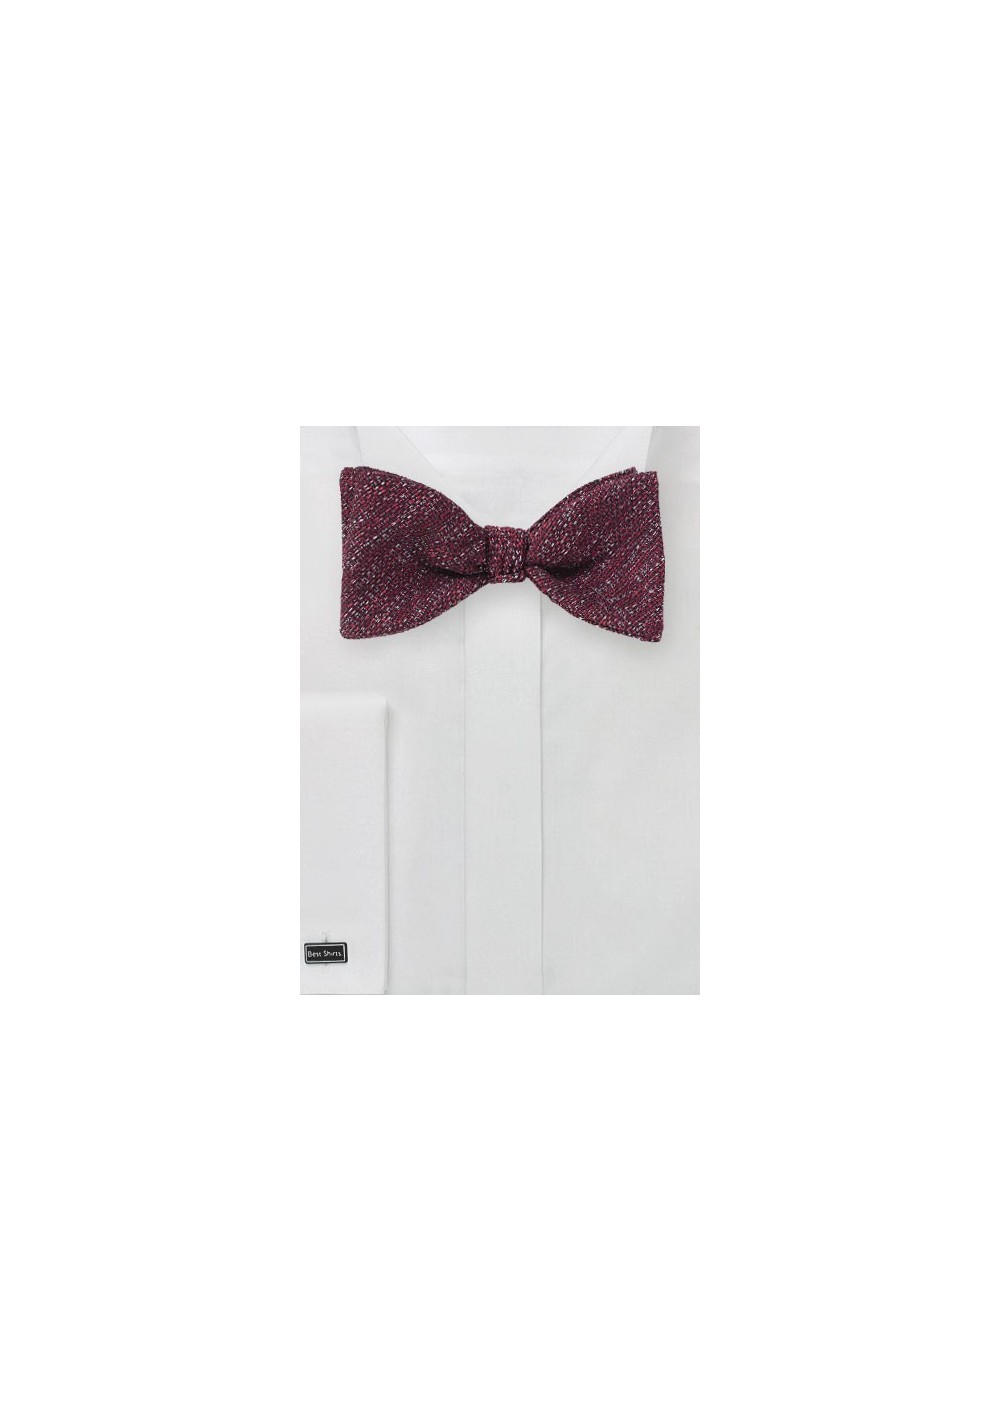 Textured Seld-Tie Bow Tie in Burgundy